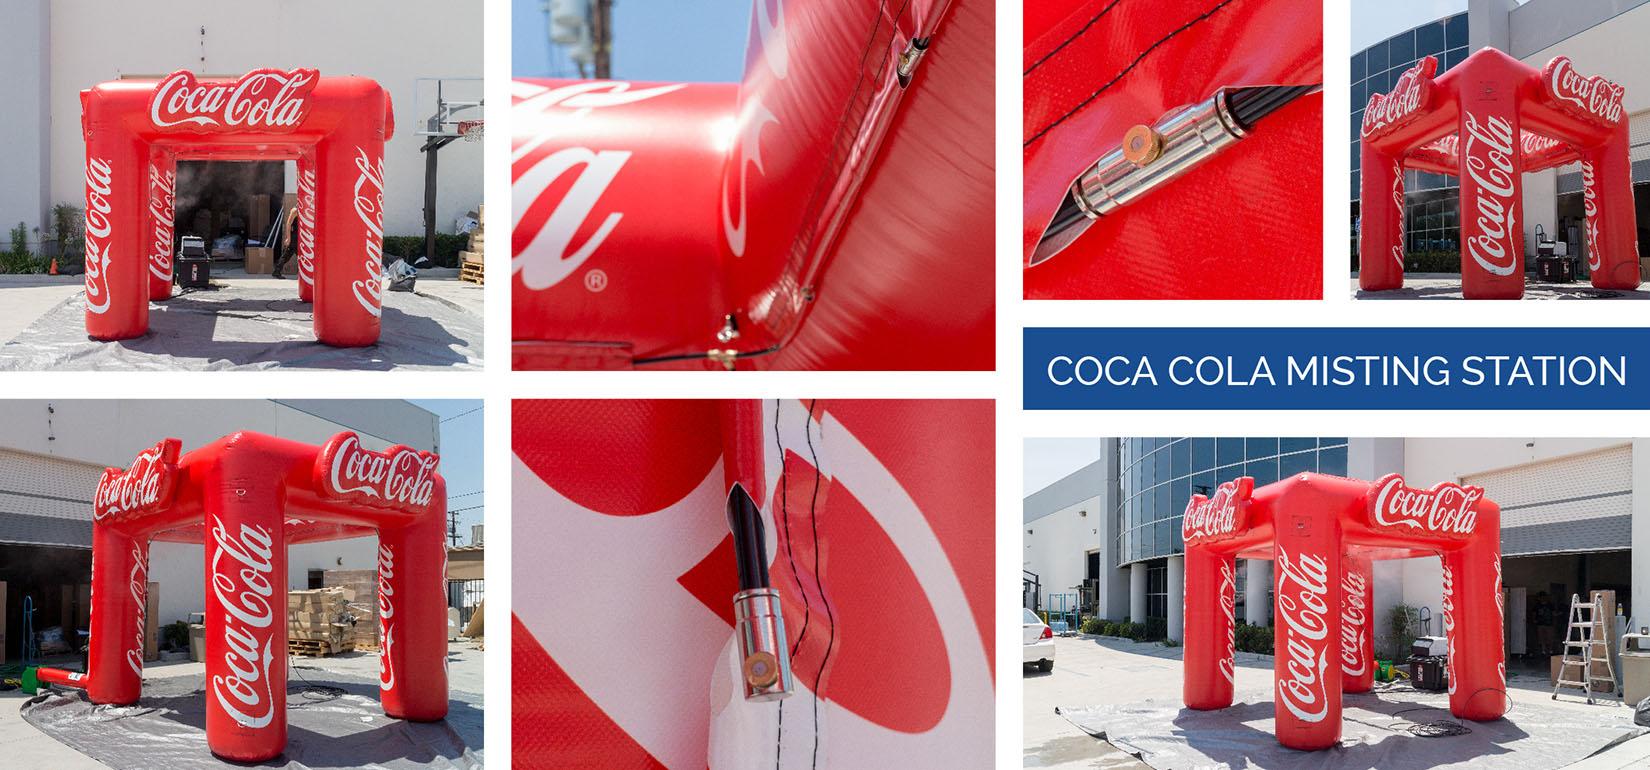 Coca-Cola-misting-station-header-01.jpg